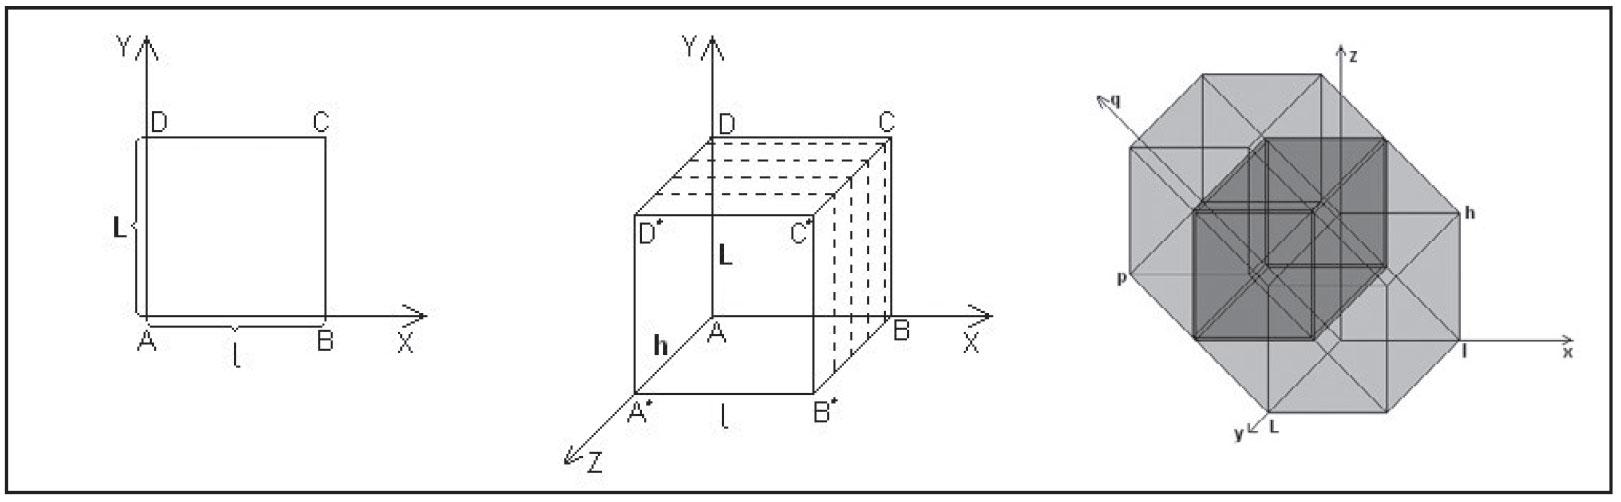 matematica-4-dimensiuni-stiinta-tehnica-8